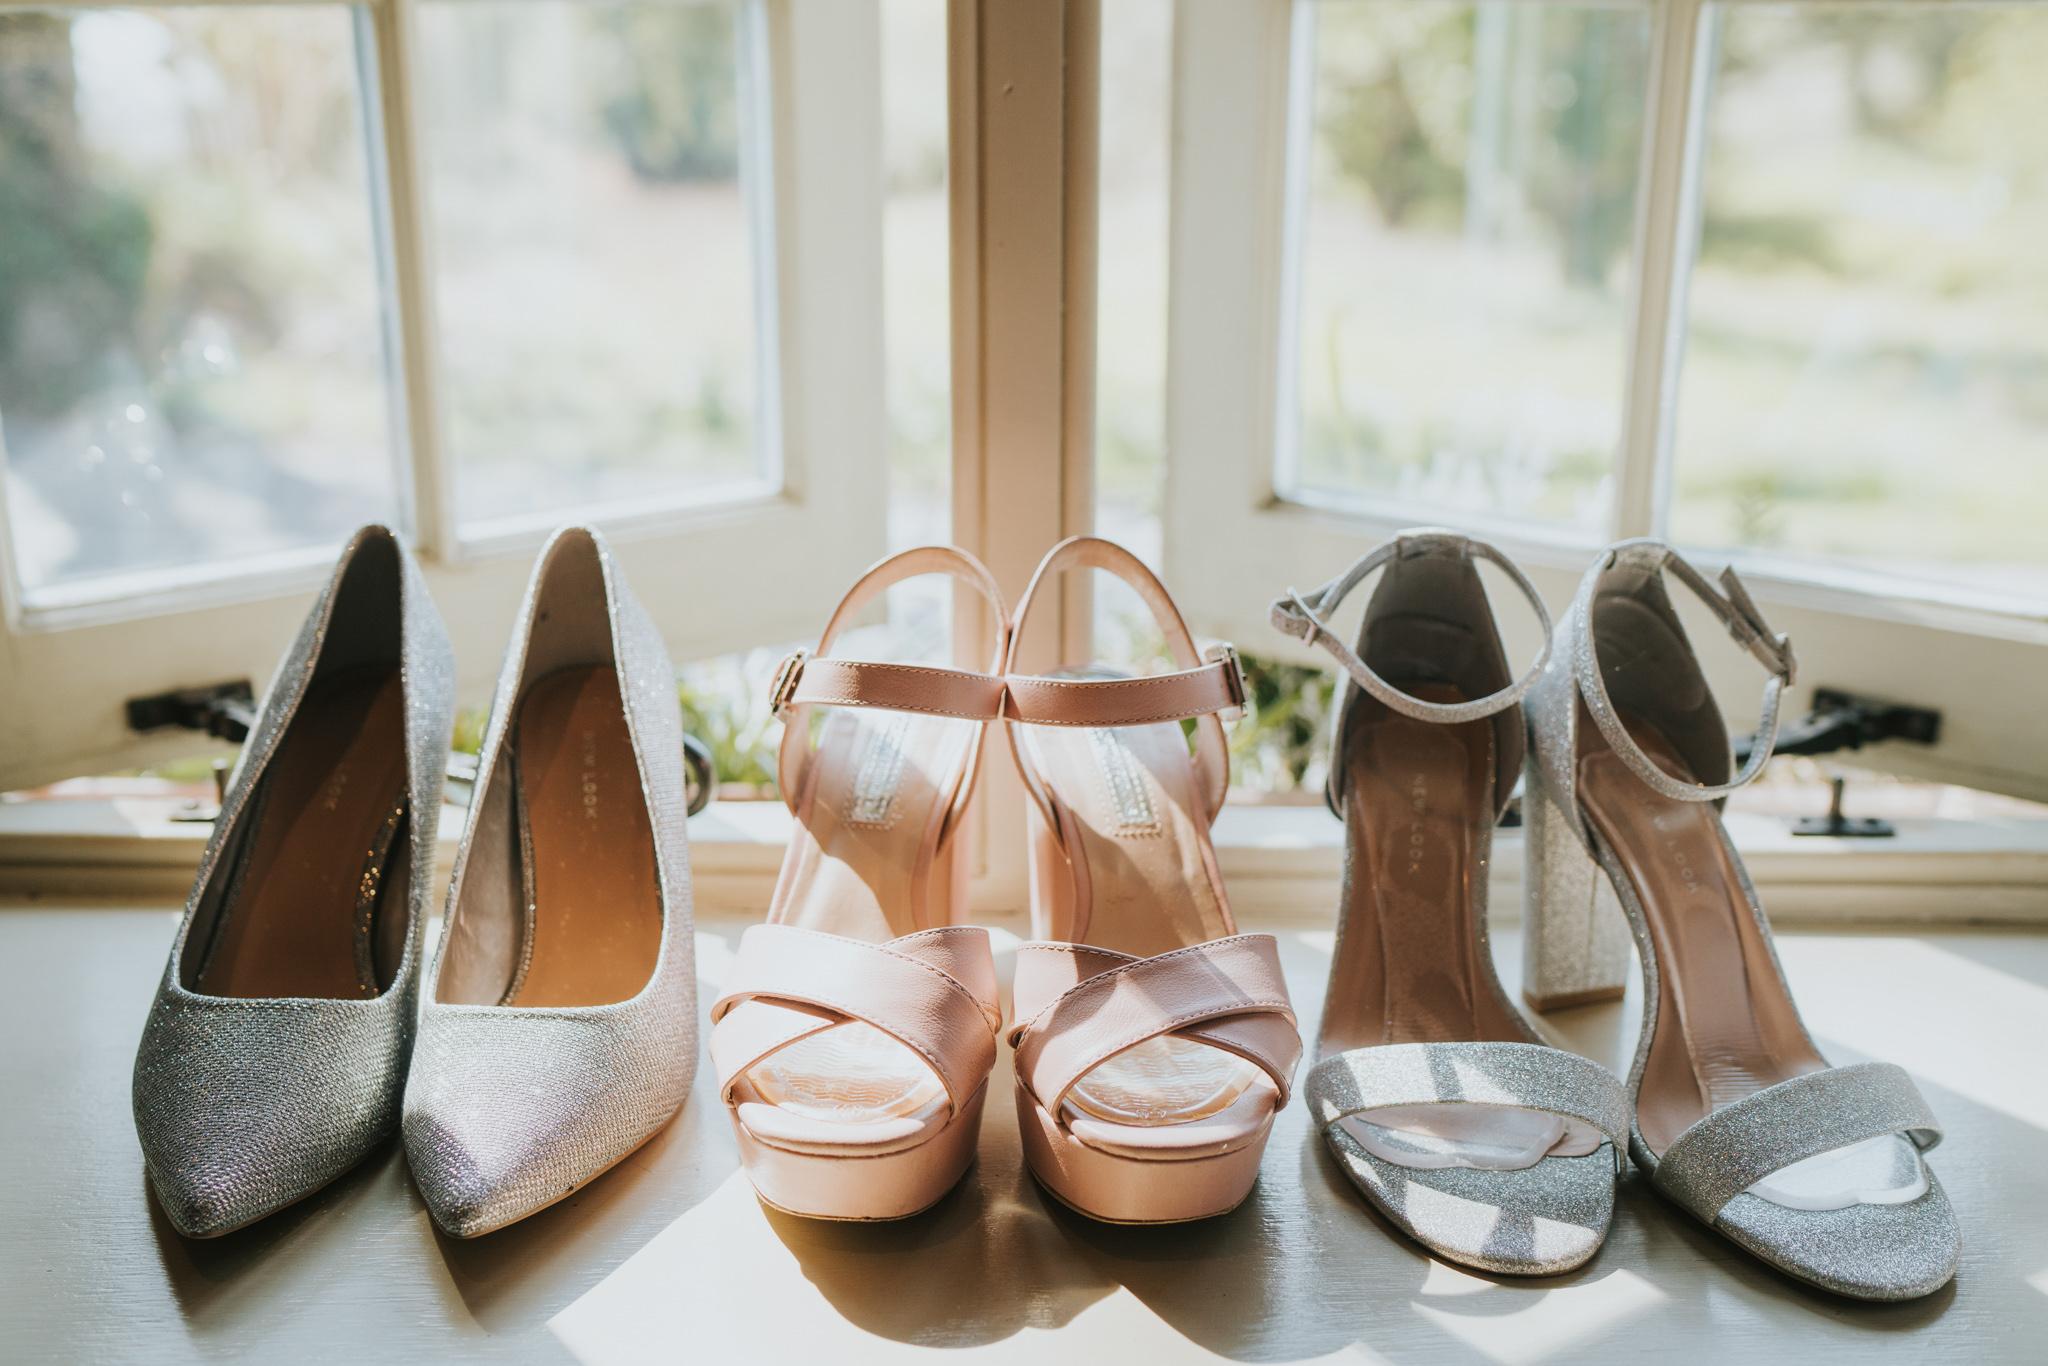 grace-sam-old-barn-clovelly-devon-wedding-photographer-grace-elizabeth-essex-suffolk-norfolk-wedding-photographer (15 of 132).jpg